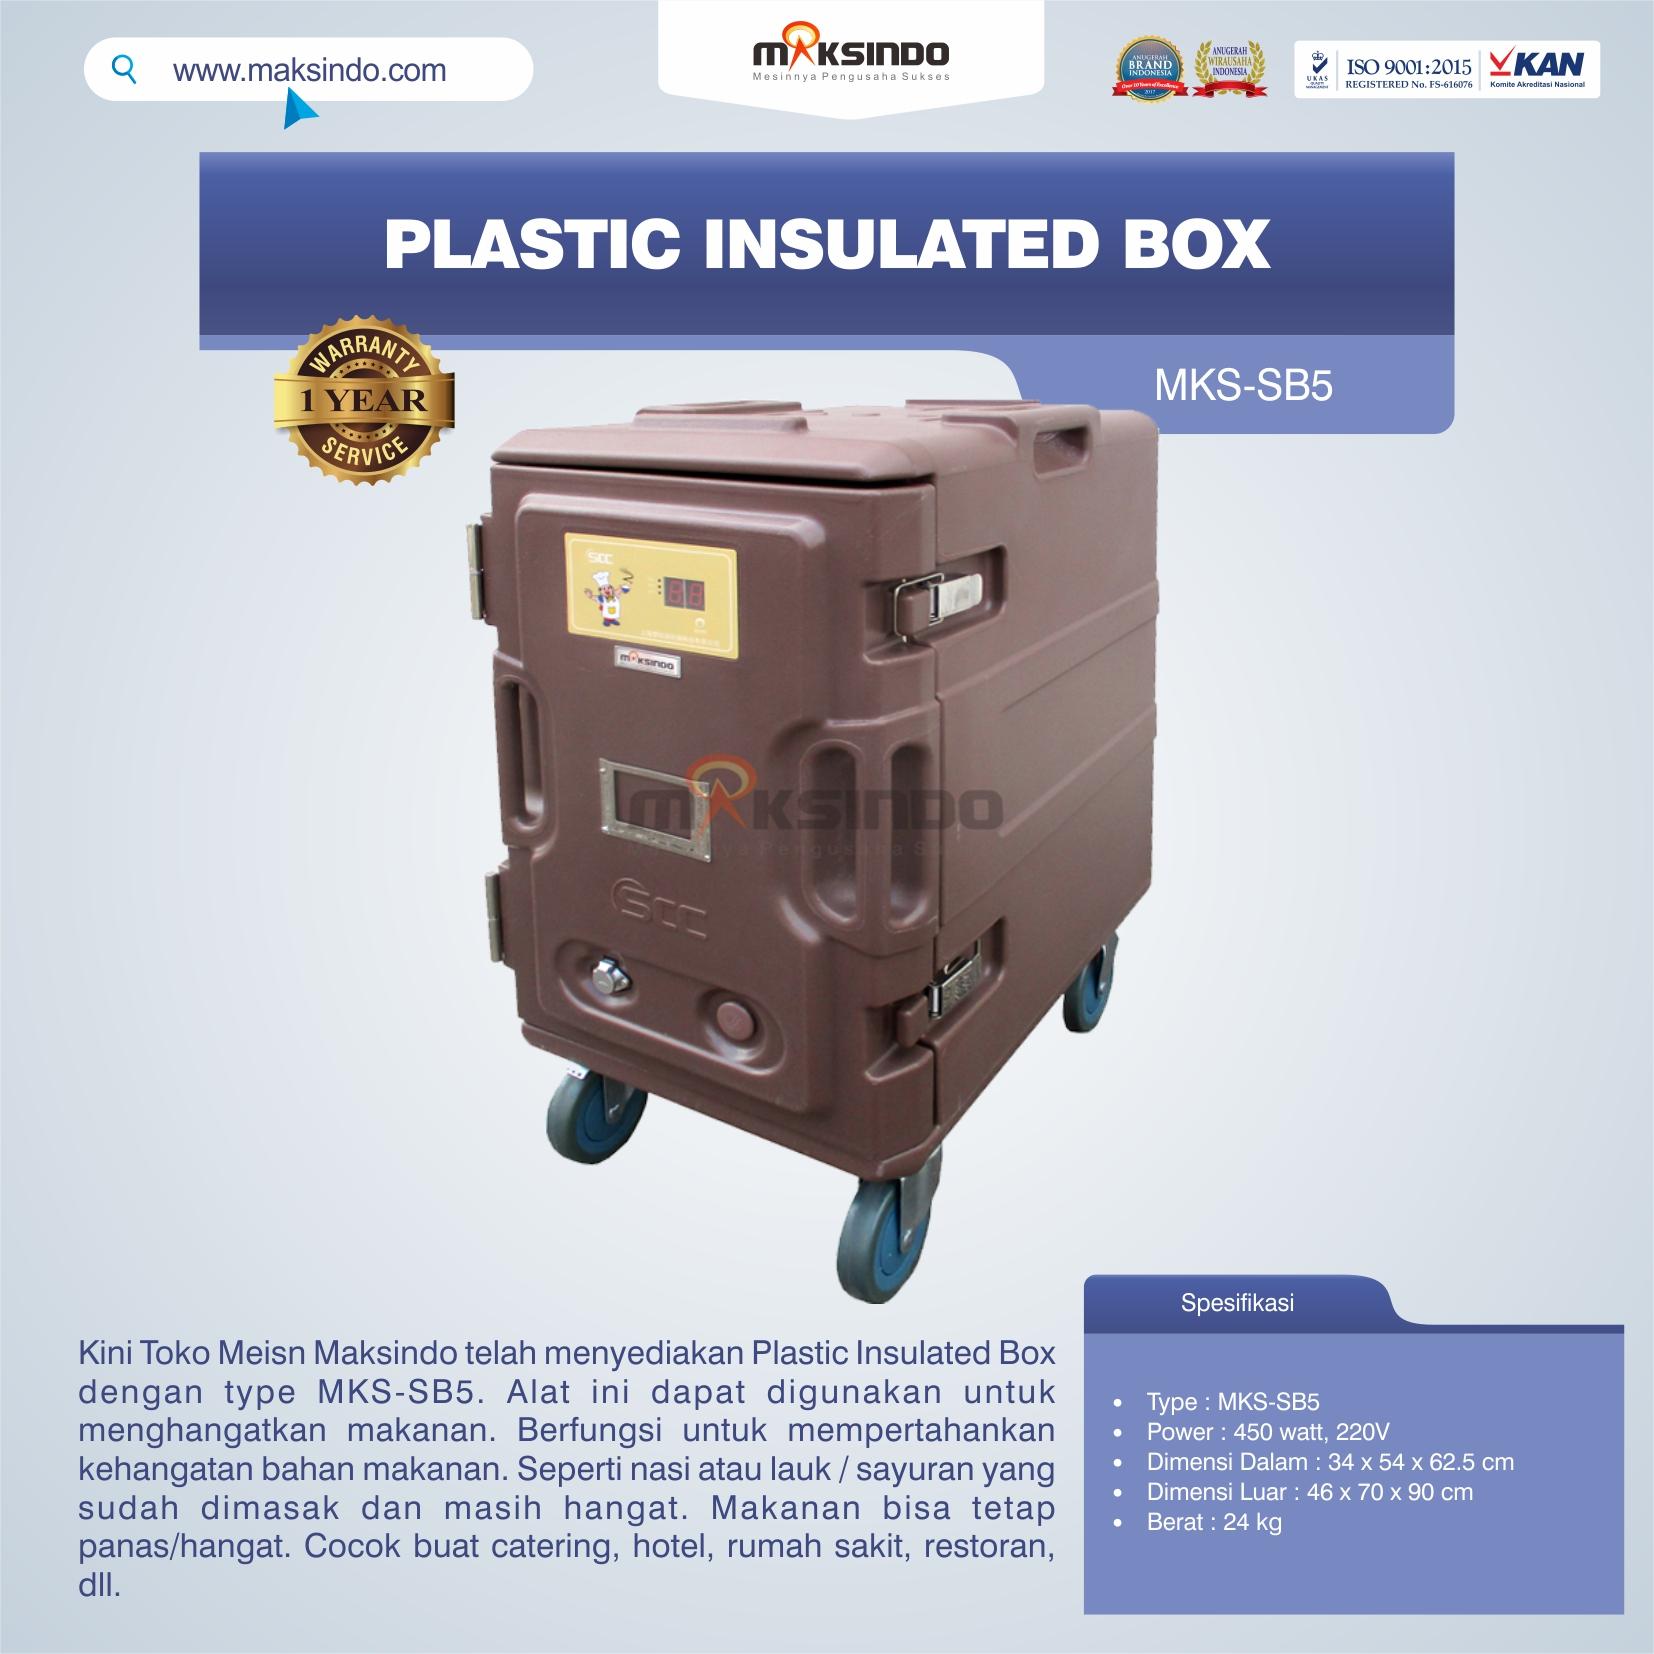 Plastic Insulated Box MKS-SB5